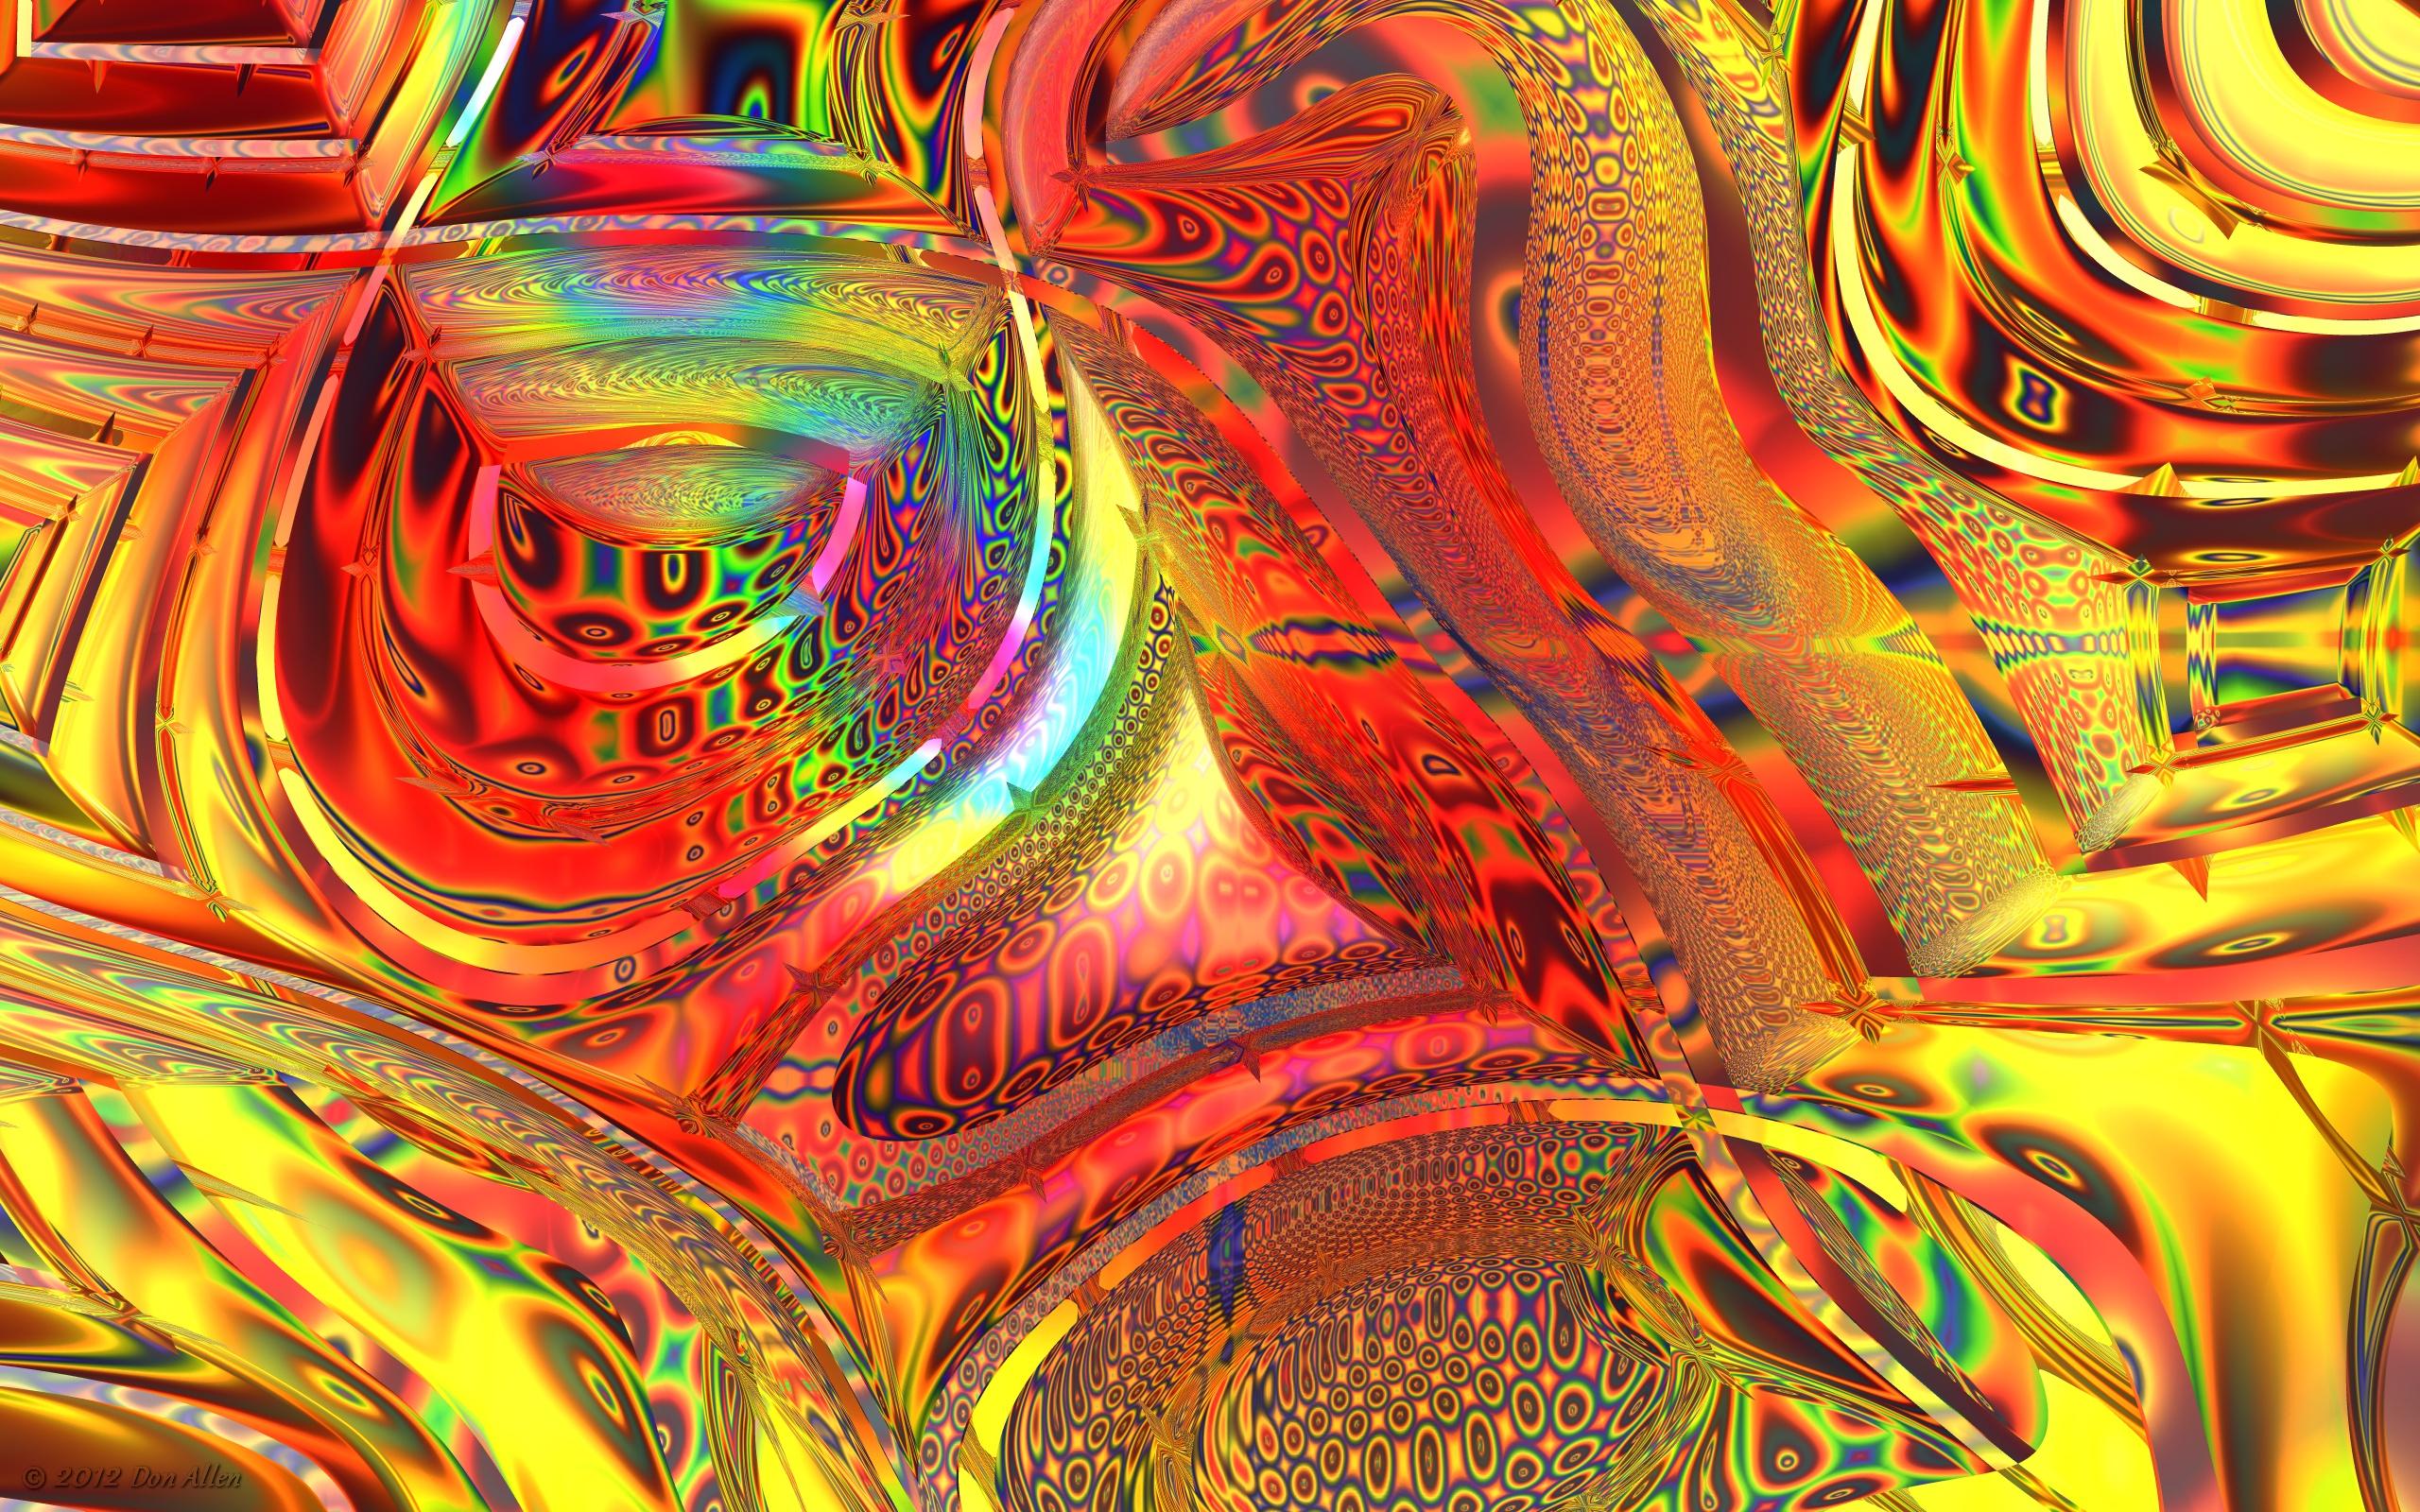 Rampant Rainbows by Don64738